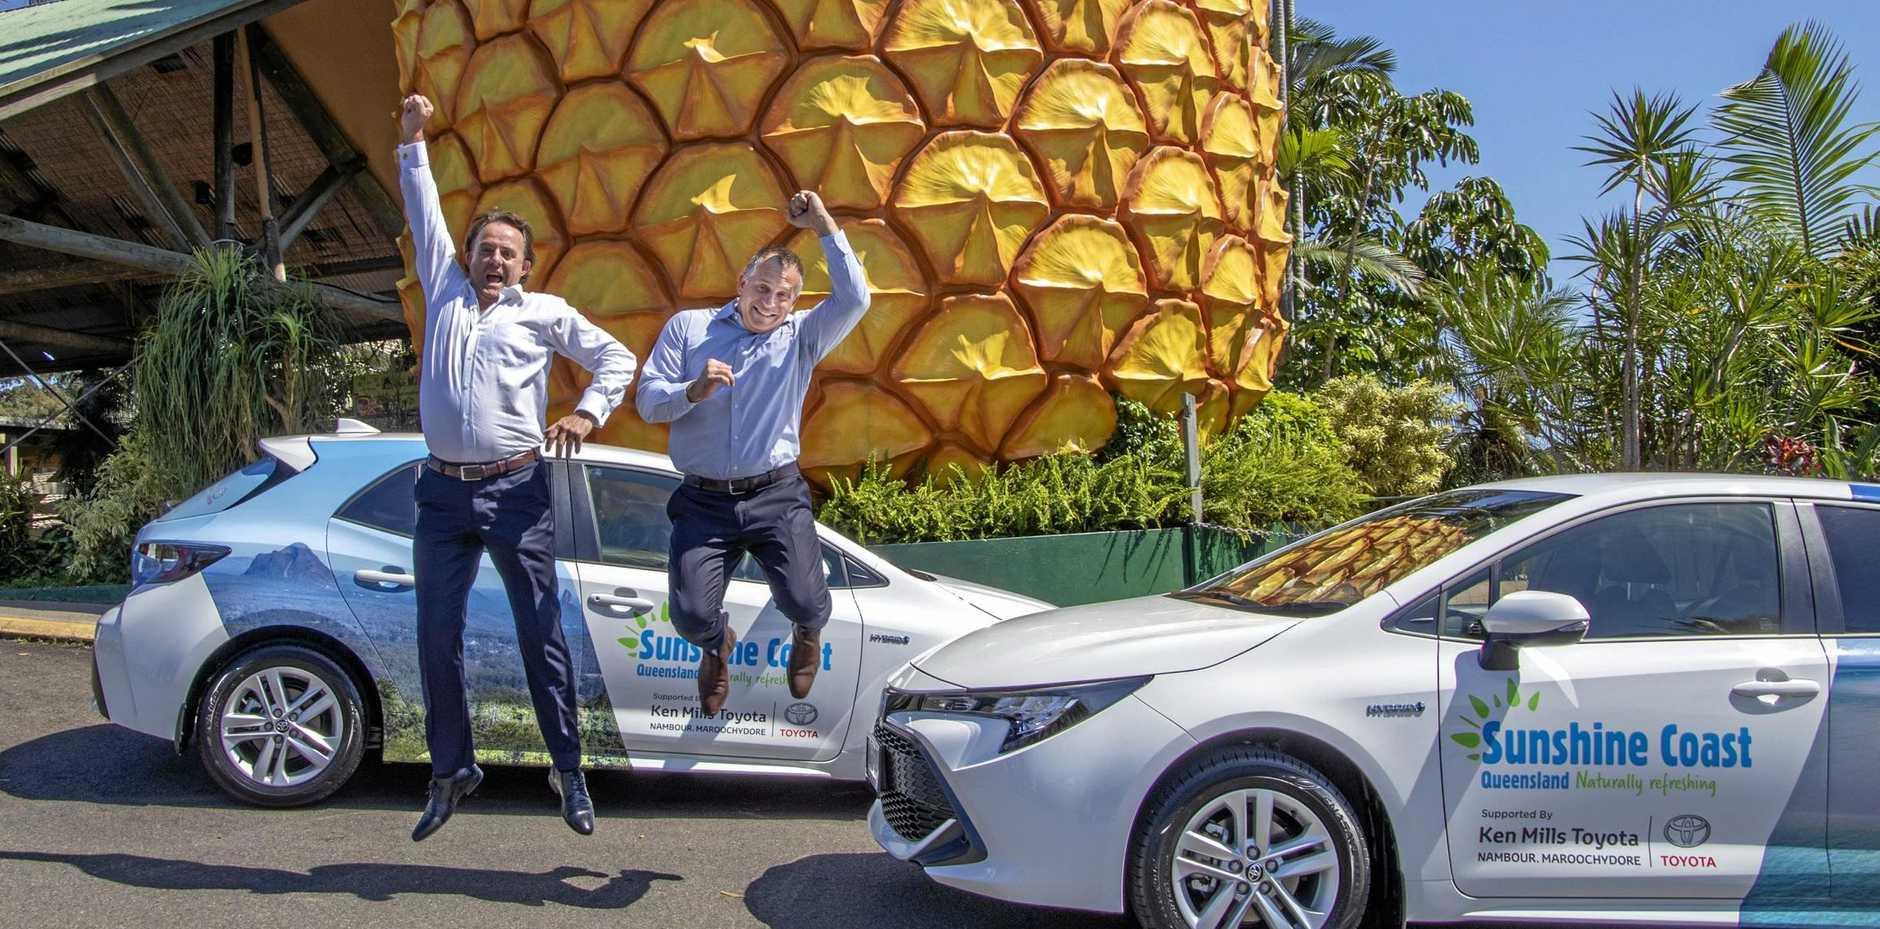 Ken Mills Toyota >> Ken Mills Toyota Helping Drive Sunshine Coast Promotion